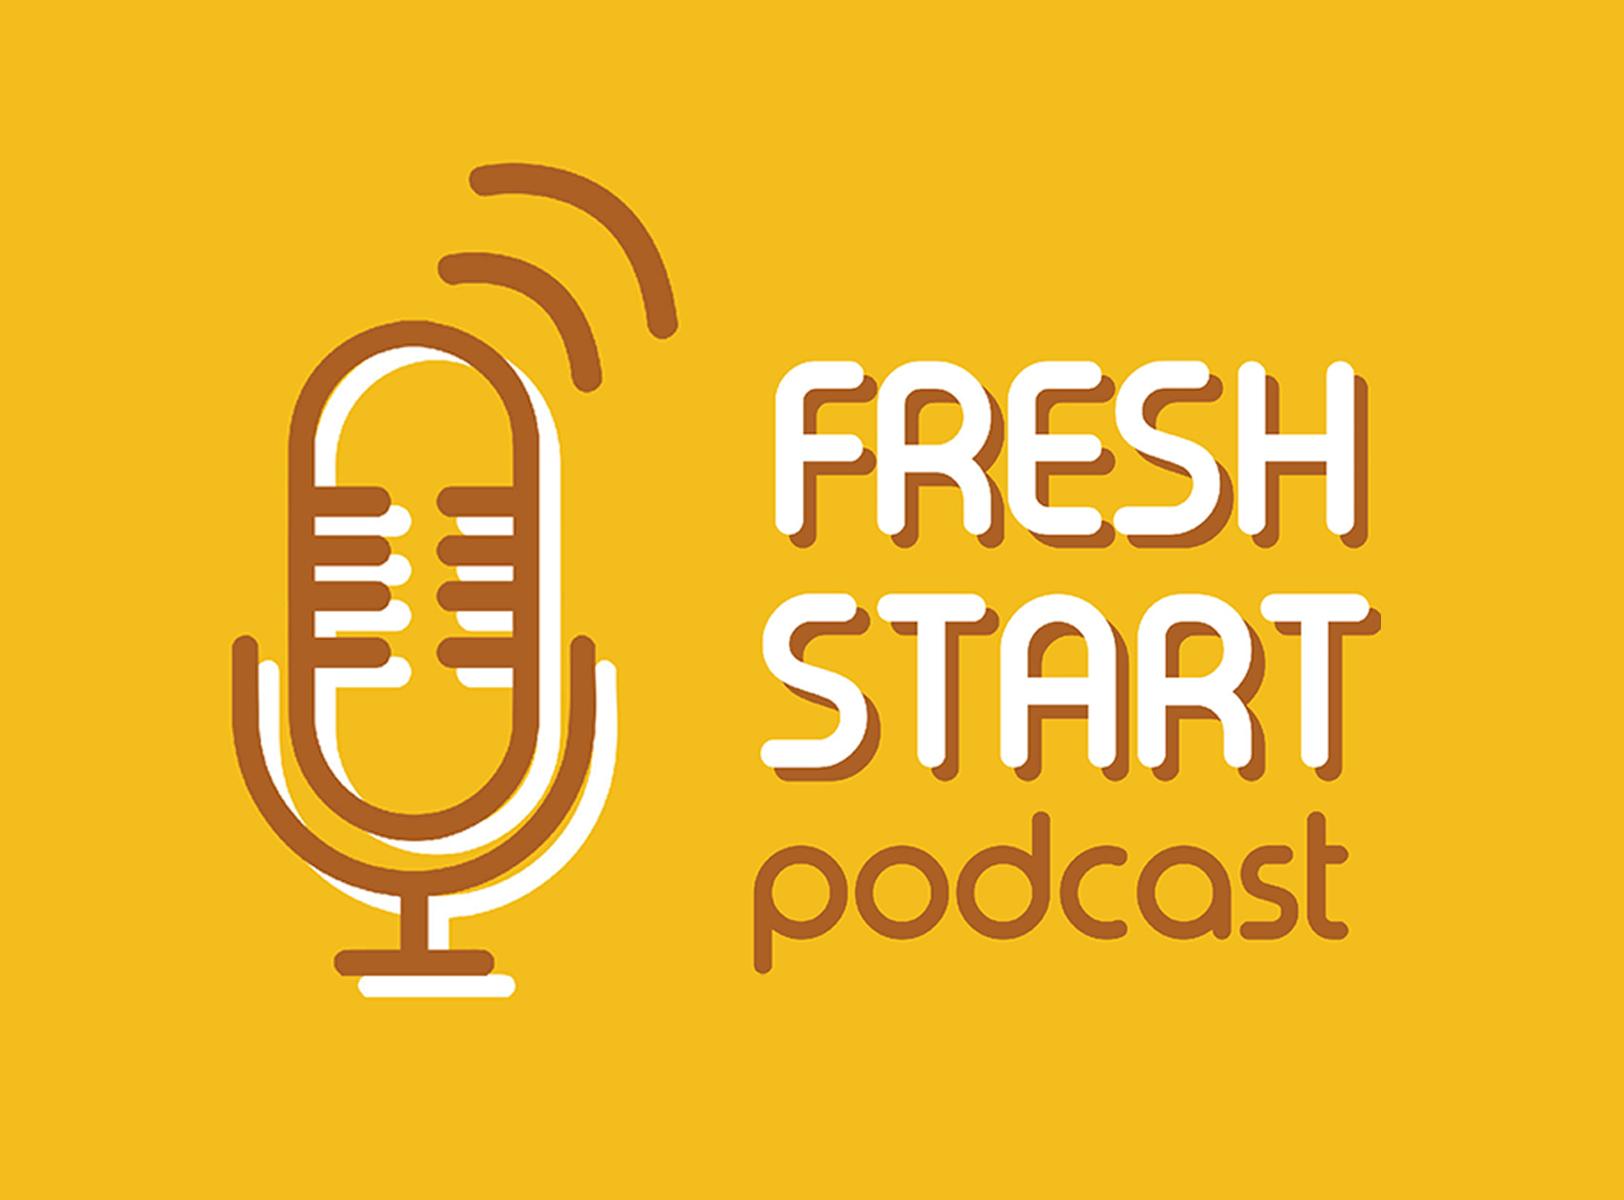 Fresh Start: Podcast News (6/16/2019 Sun.)